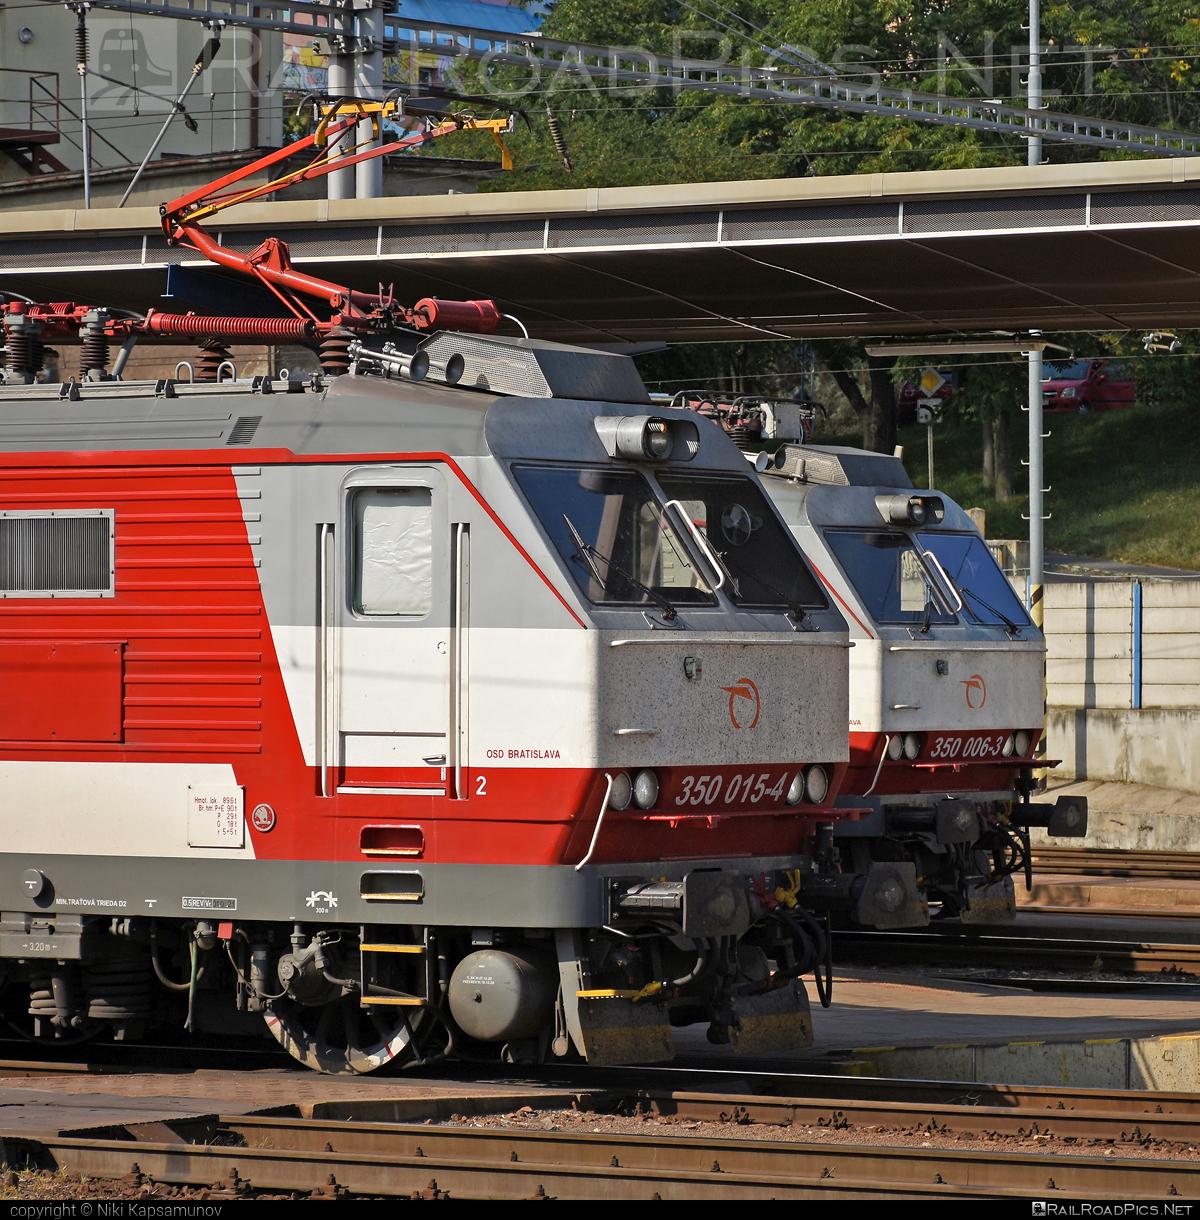 Škoda 55E - 350 015-4 operated by Železničná Spoločnost' Slovensko, a.s. #ZeleznicnaSpolocnostSlovensko #gorila #locomotive350 #skoda #skoda55e #zssk